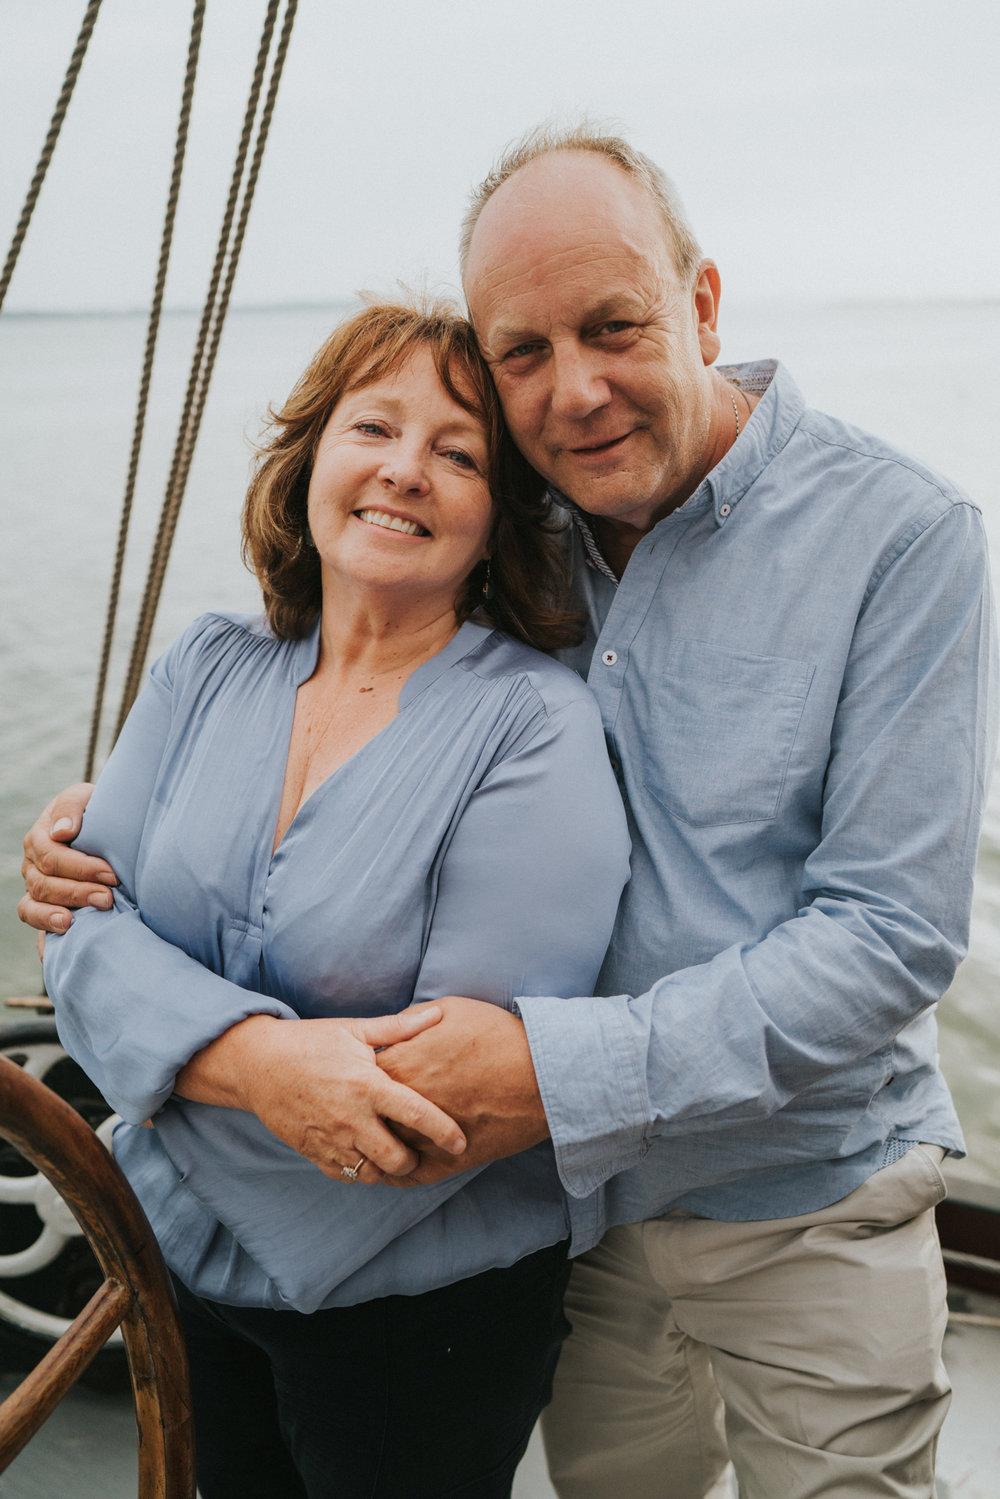 Parkers-Extended-Family-Session-Grace-Elizabeth-Alternative-Wedding-Lifestyle-Photographer-Colchester-Essex-Norfolk-Suffolk-Devon (47 of 62).jpg